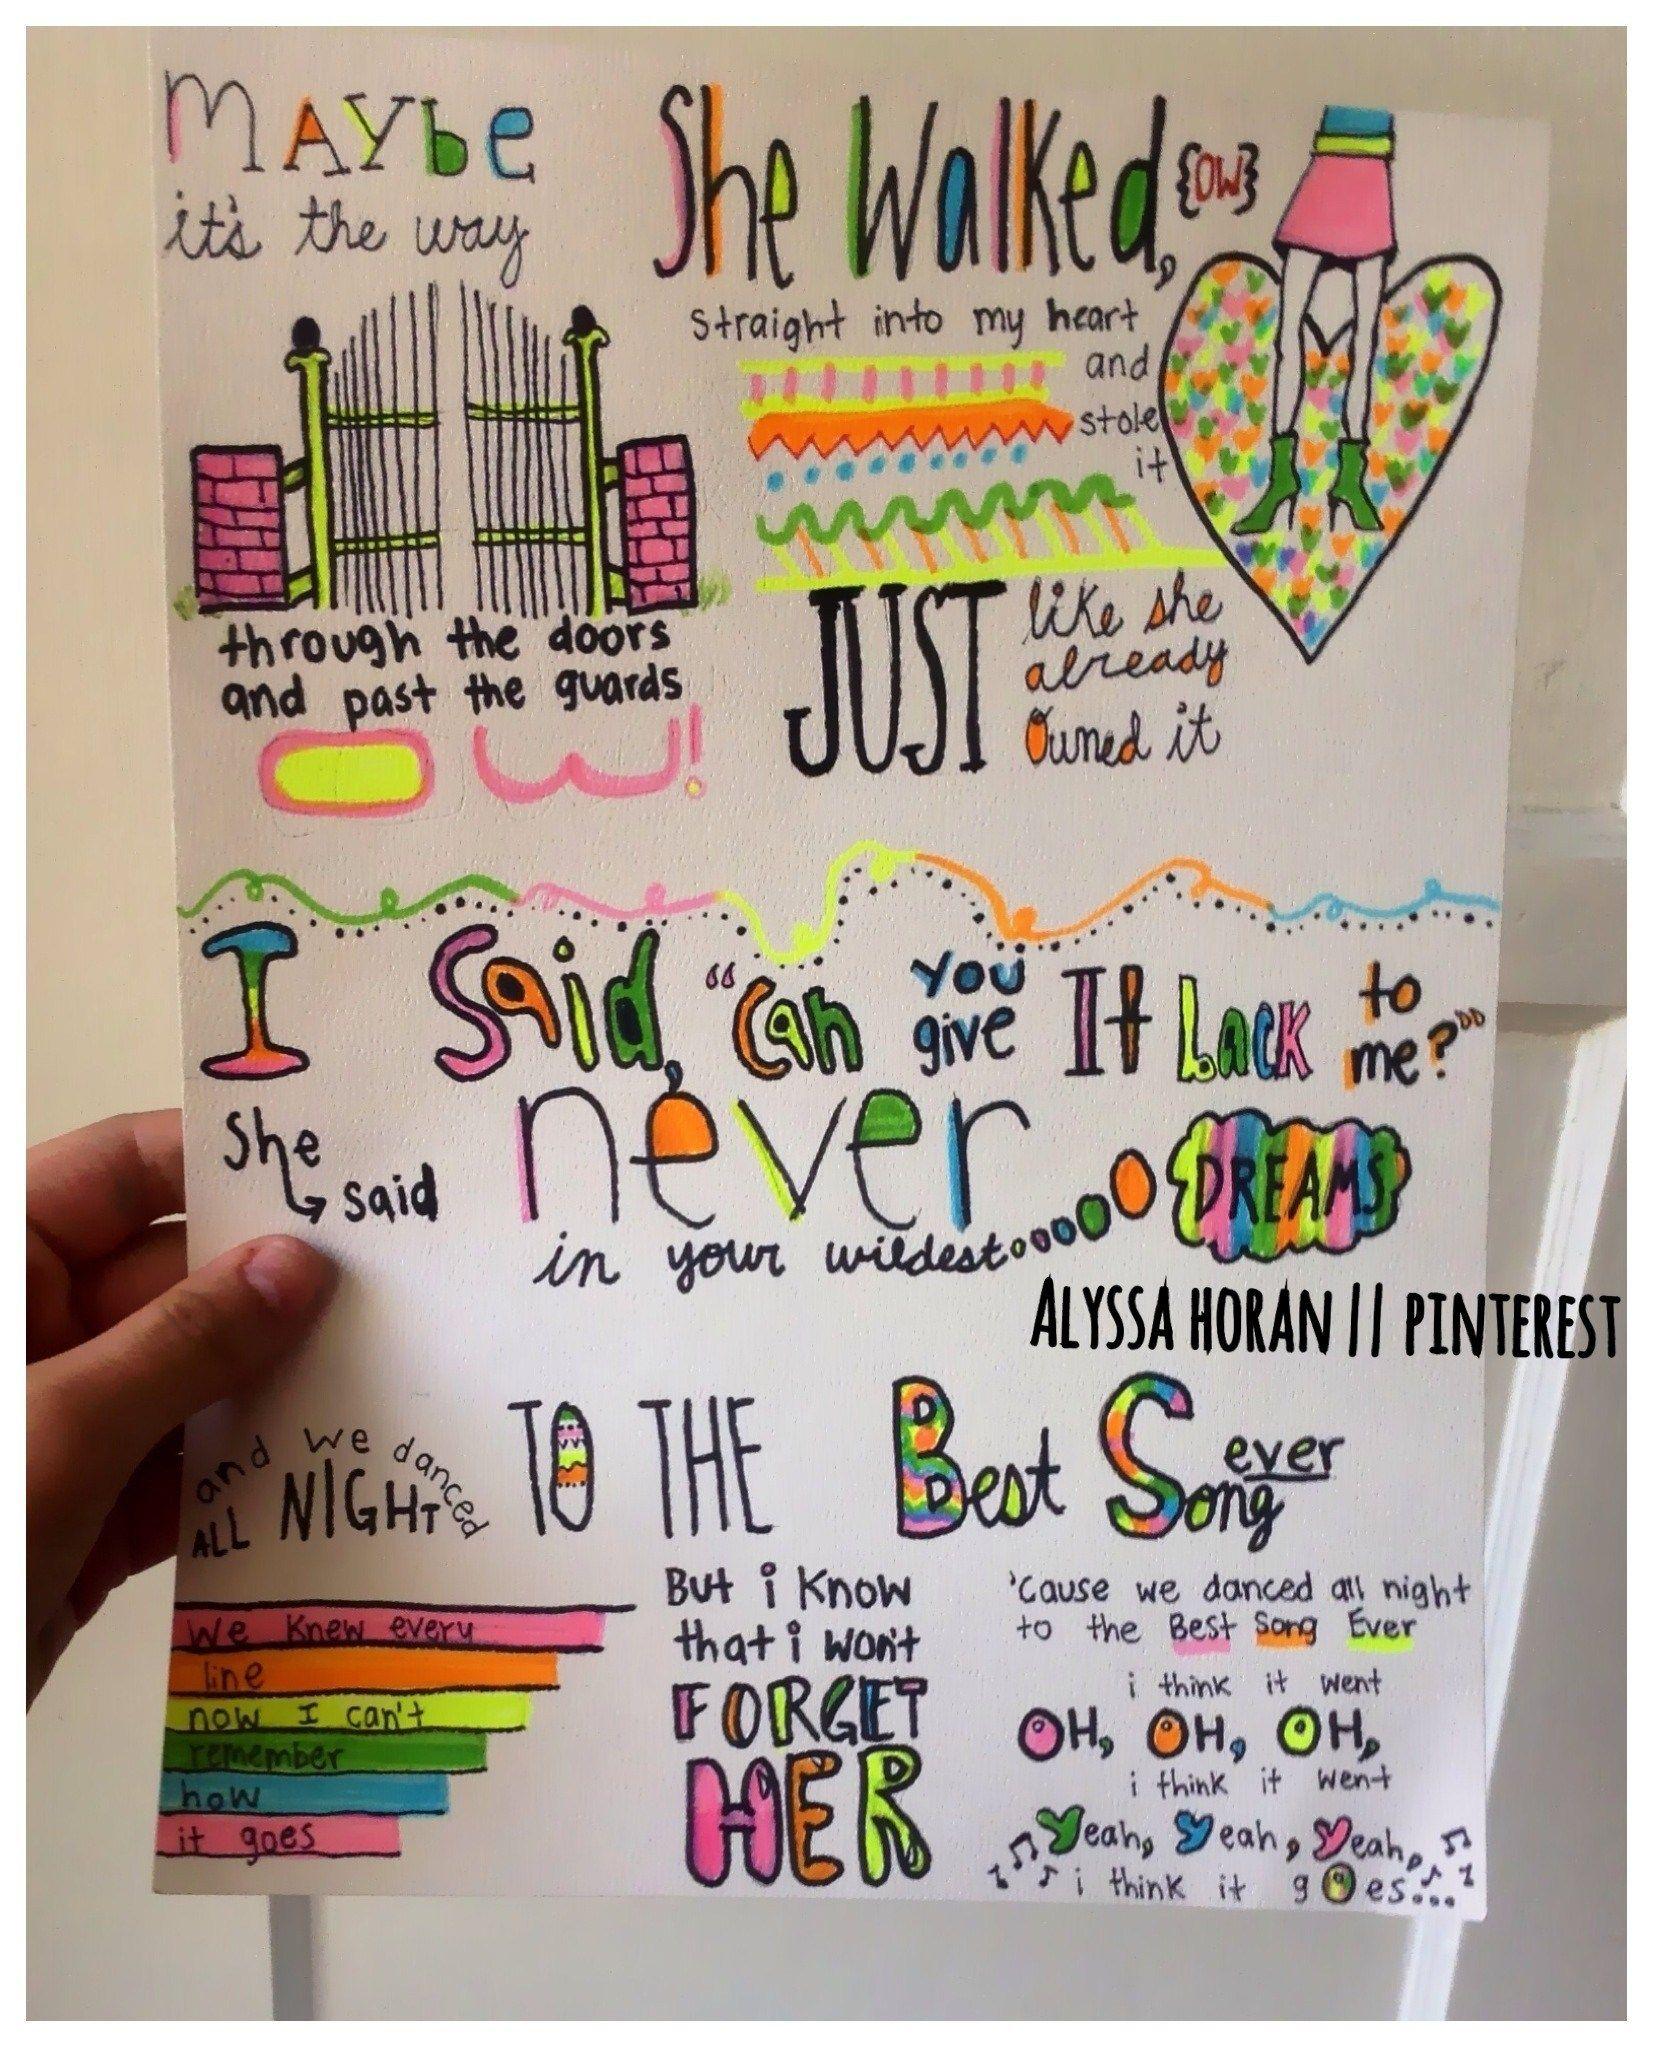 24 Song Lyrics That Define Our Love Lives